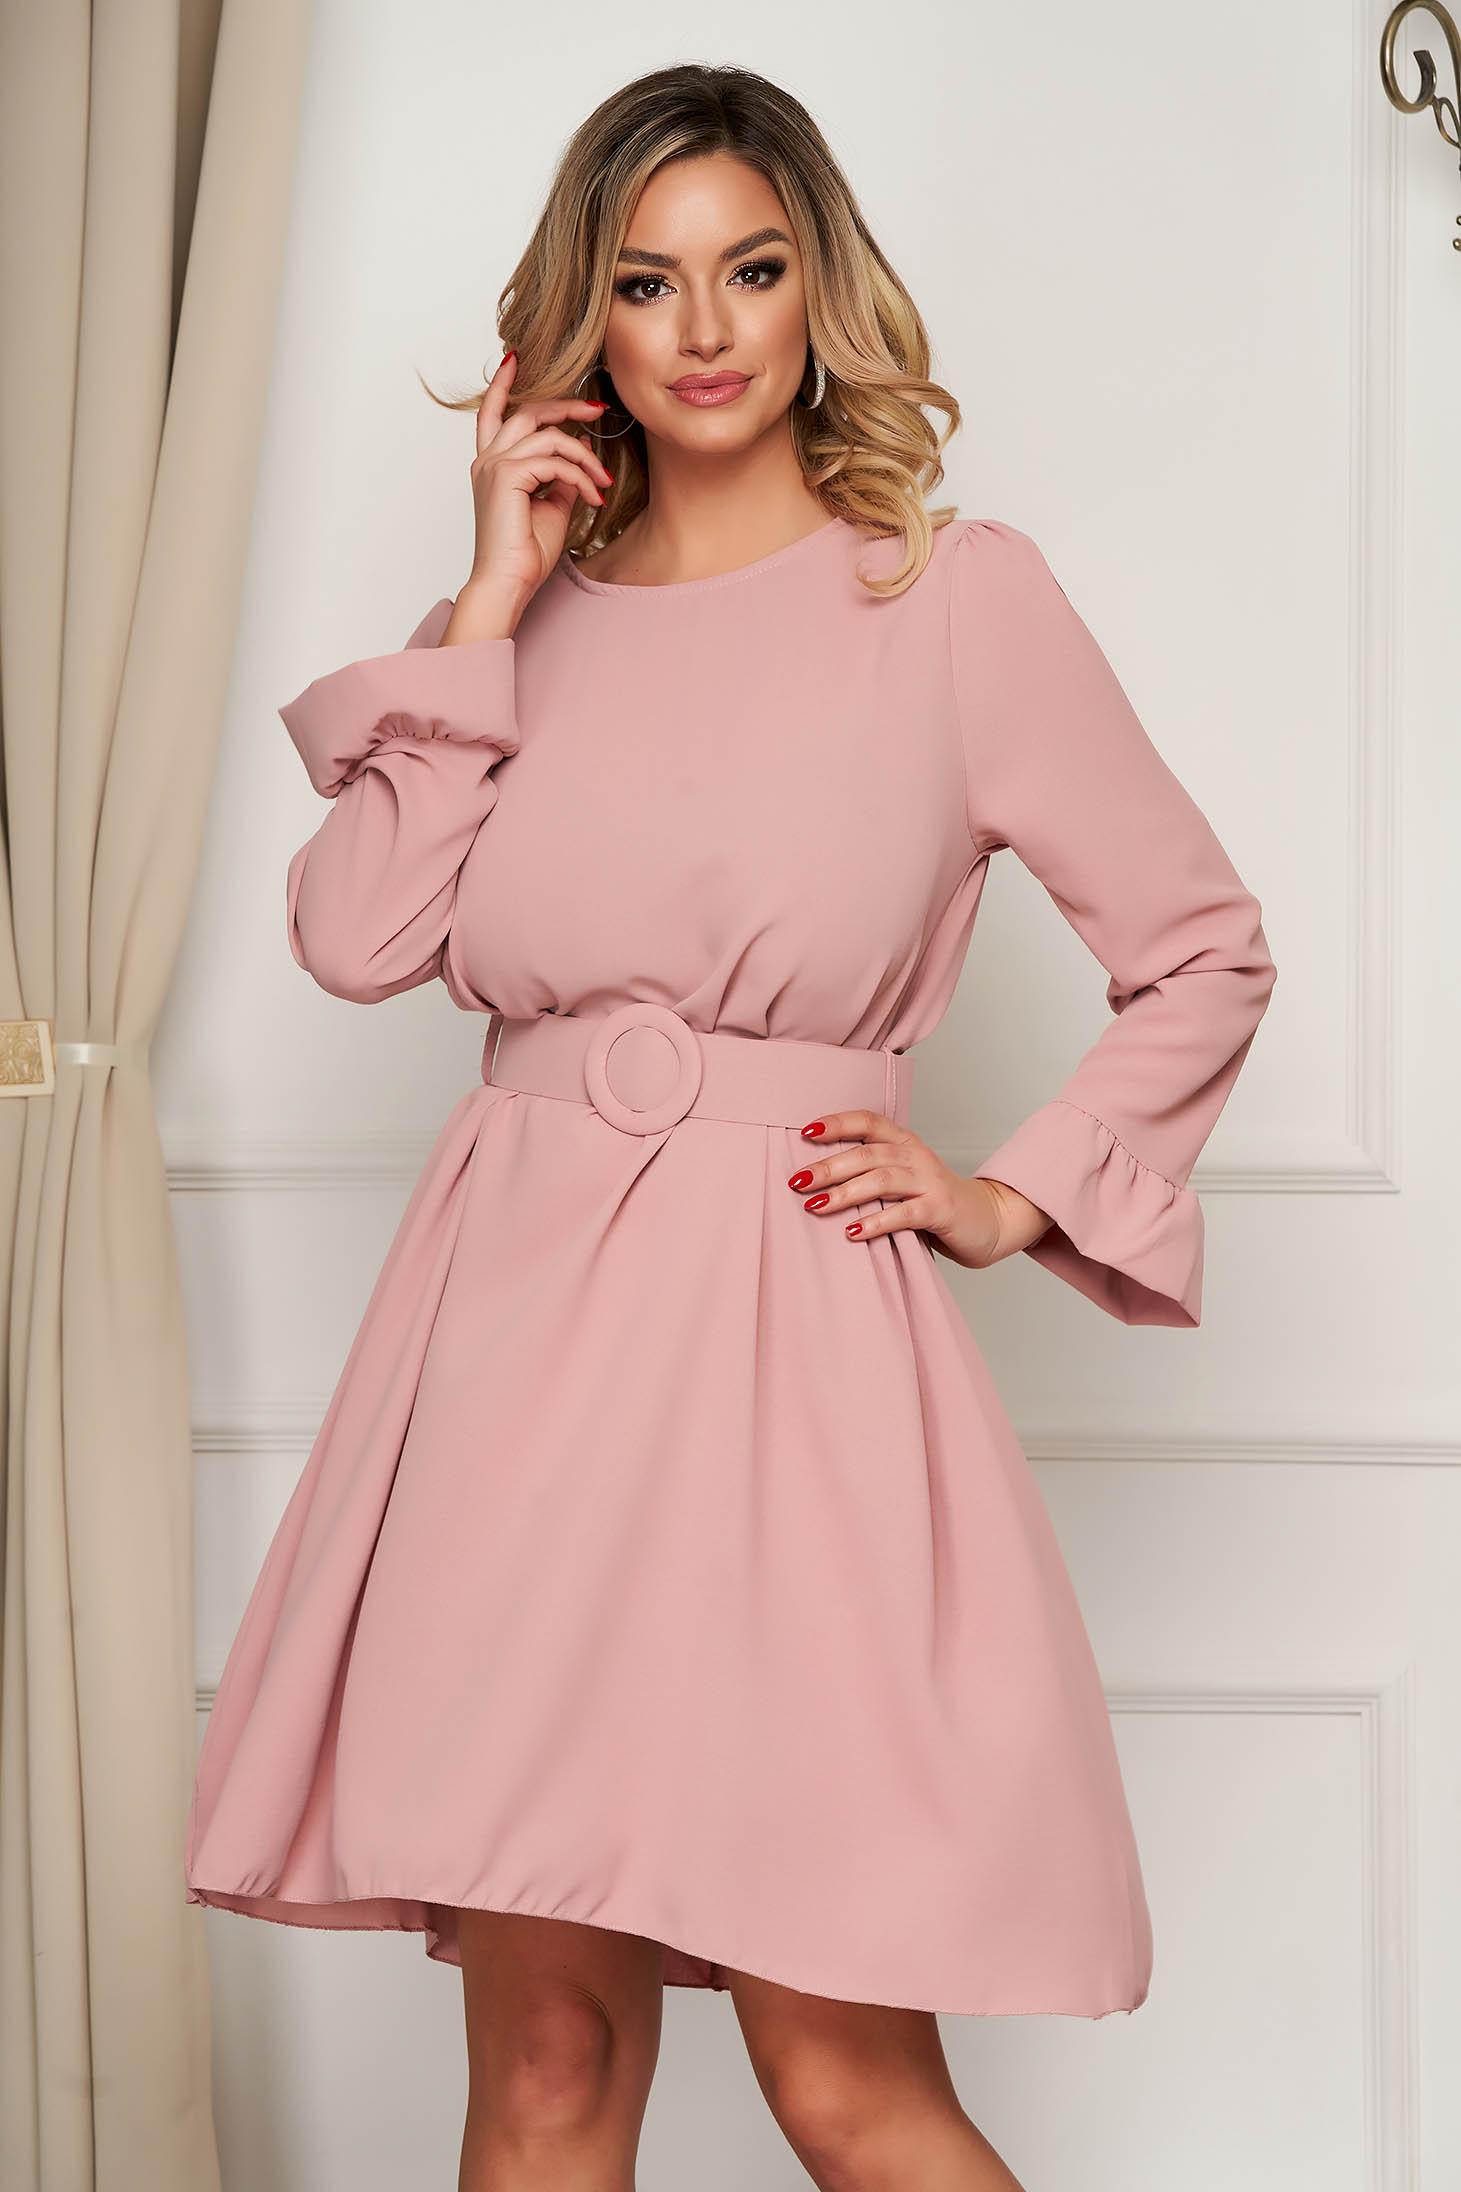 Rochie SunShine roz prafuit eleganta scurta in clos cu maneci clopot